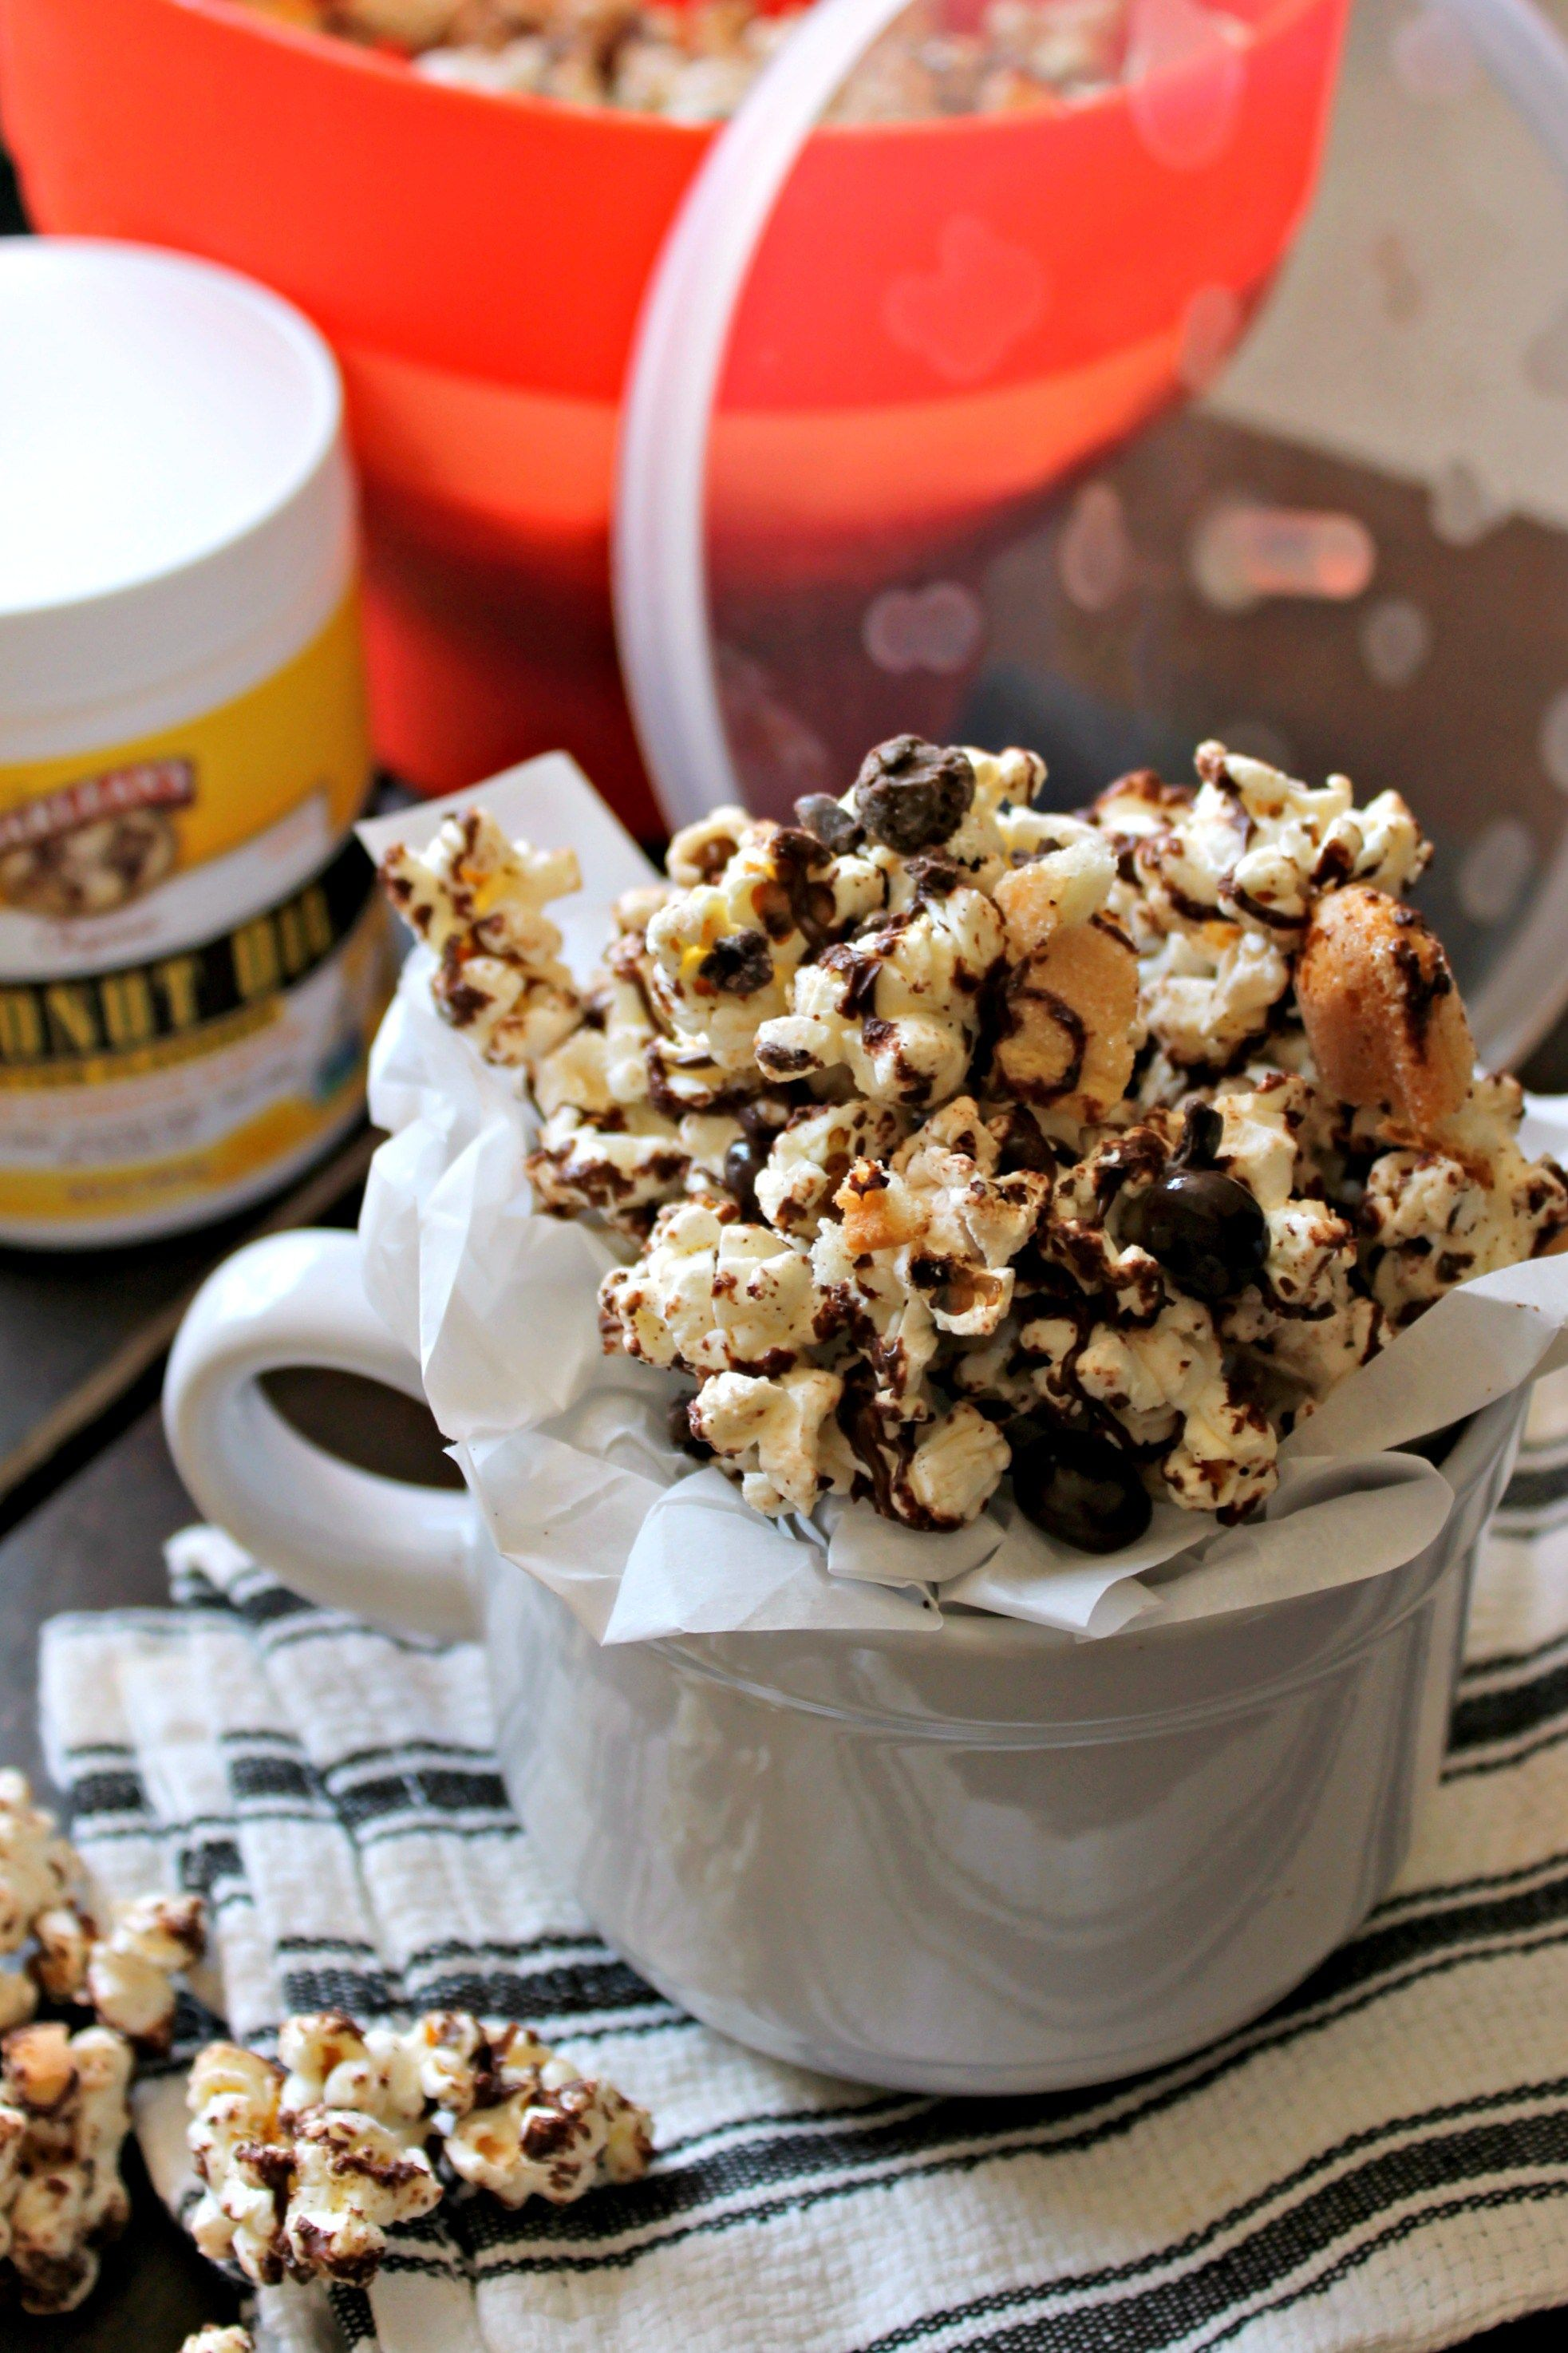 Chocolate Toffee Tiramisu Popcorn The Kitchen Prep Blog Recipe Chocolate Toffee Popcorn Treats Finger Cookies